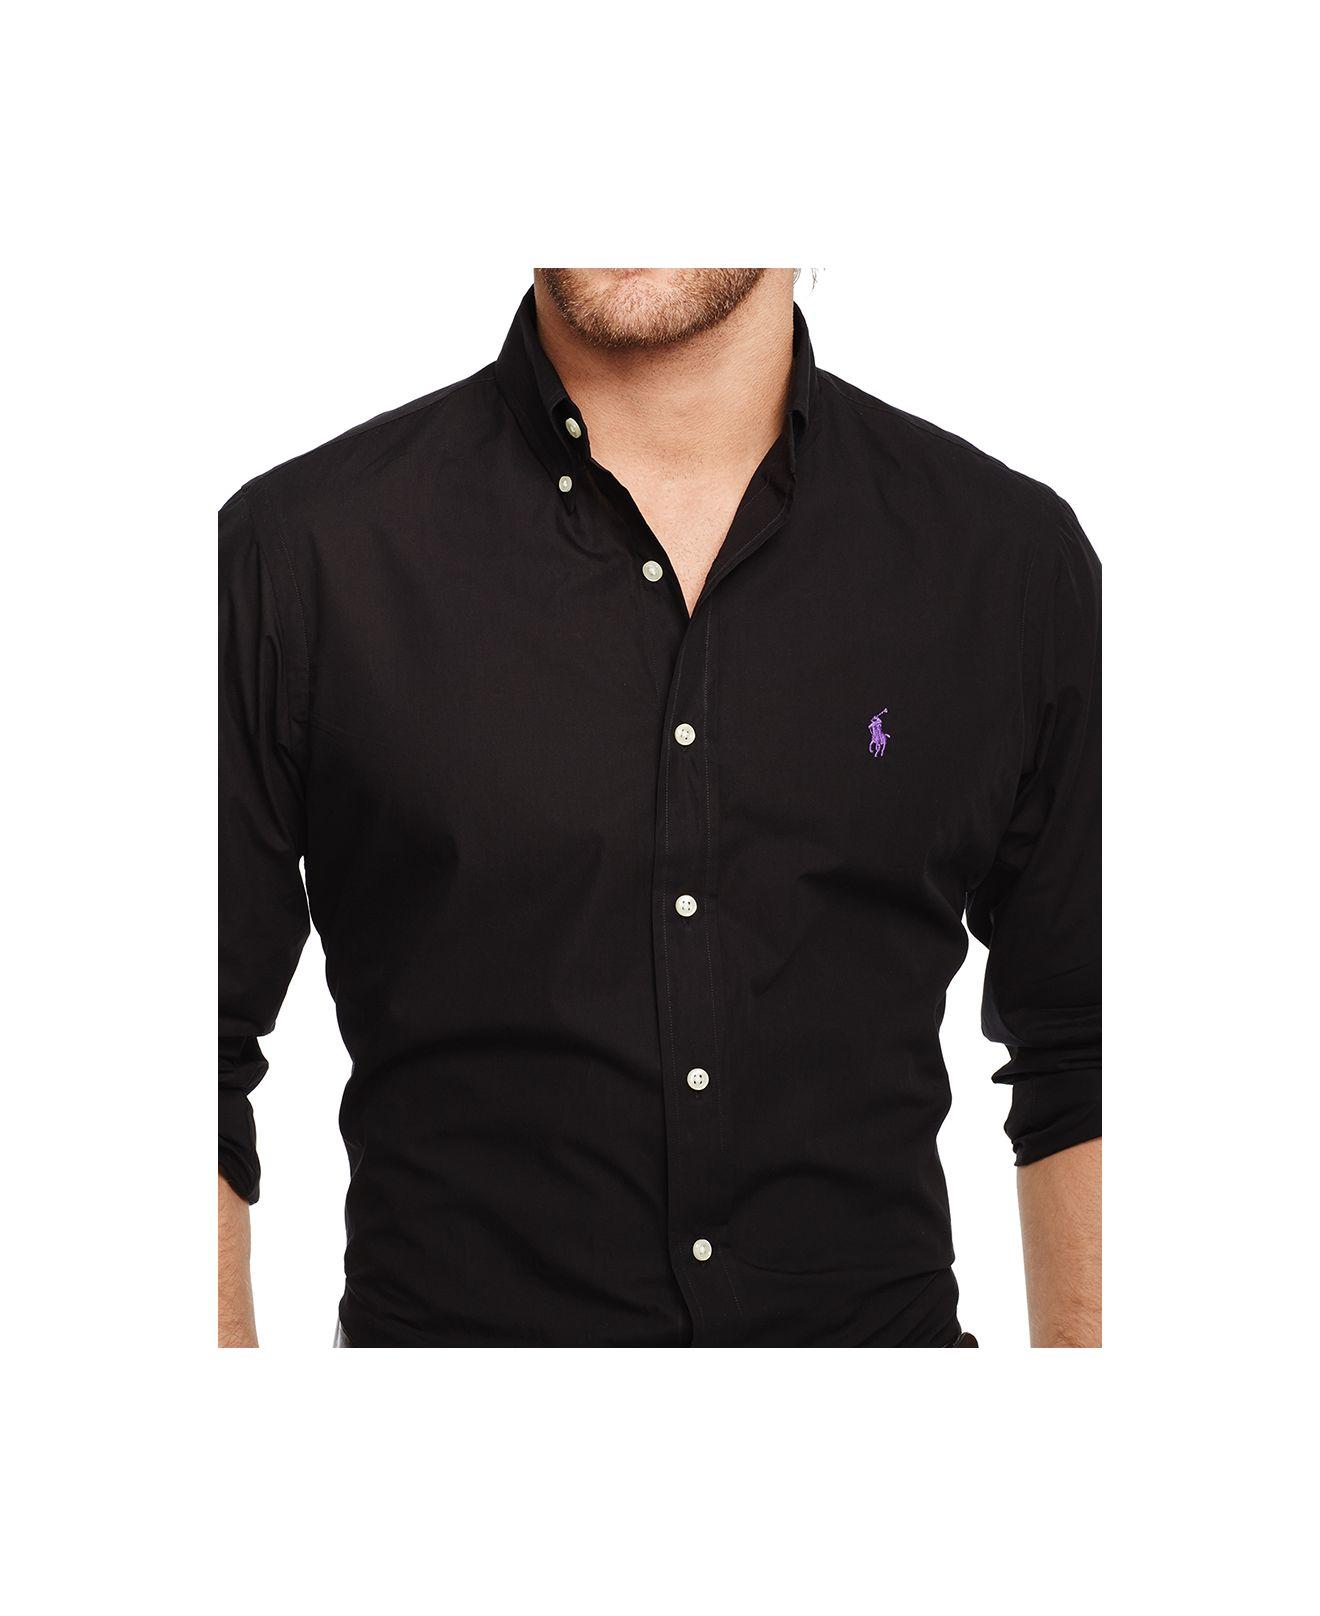 polo ralph lauren men 39 s slim fit poplin shirt in black for. Black Bedroom Furniture Sets. Home Design Ideas